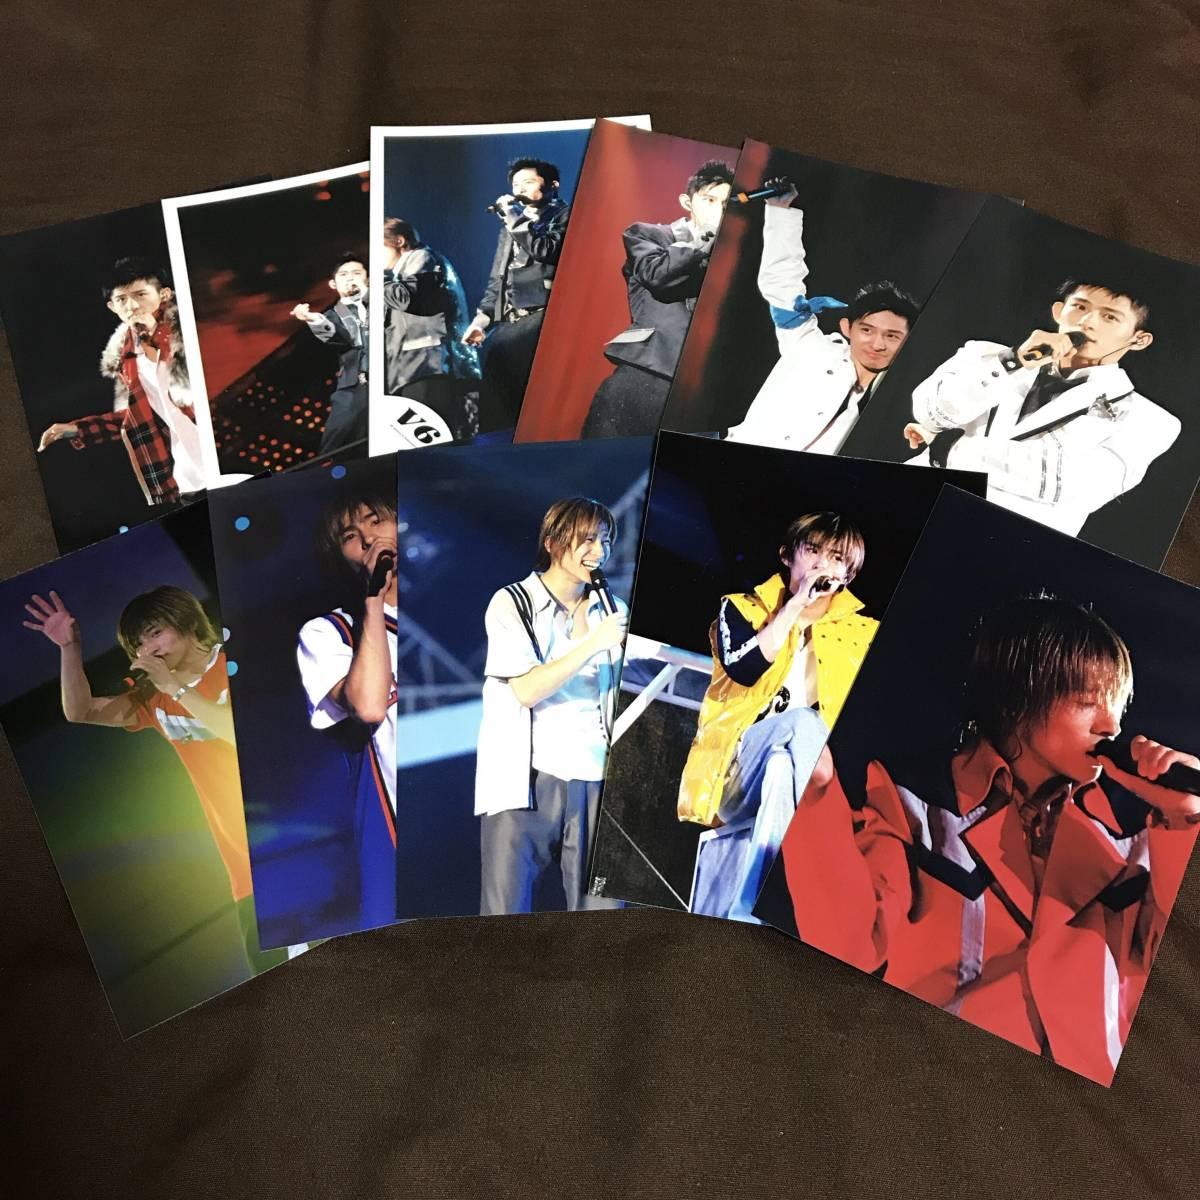 V6 三宅健 公式写真 写真 ブロマイド グッズ ② コンサートグッズの画像